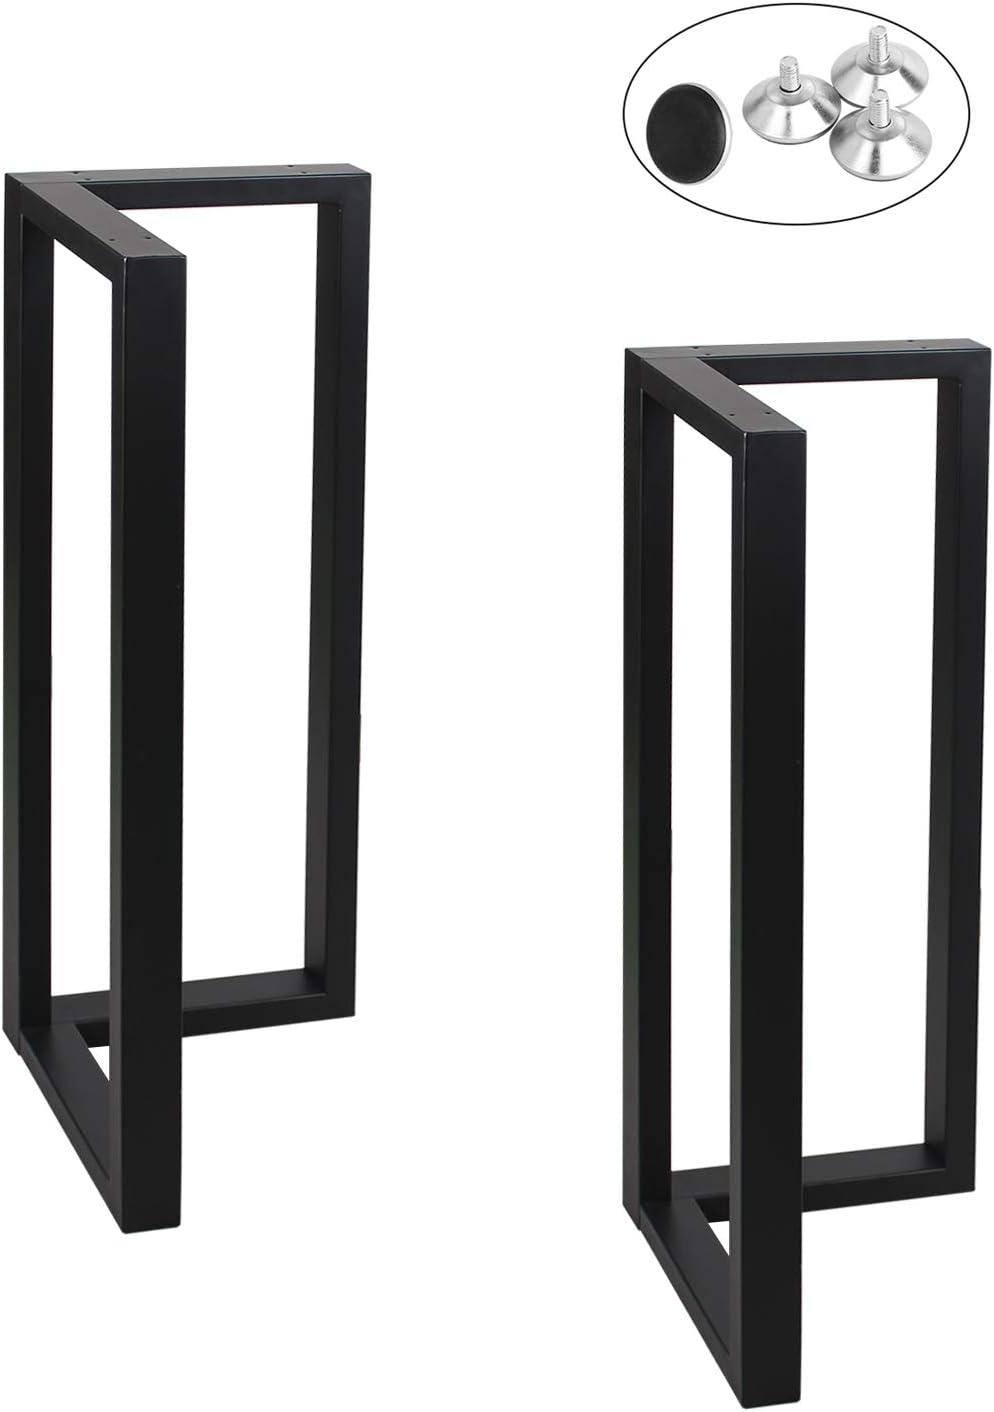 "MBQQ Furniture Legs 35""Height 17.7""Wide Rustic Decory"